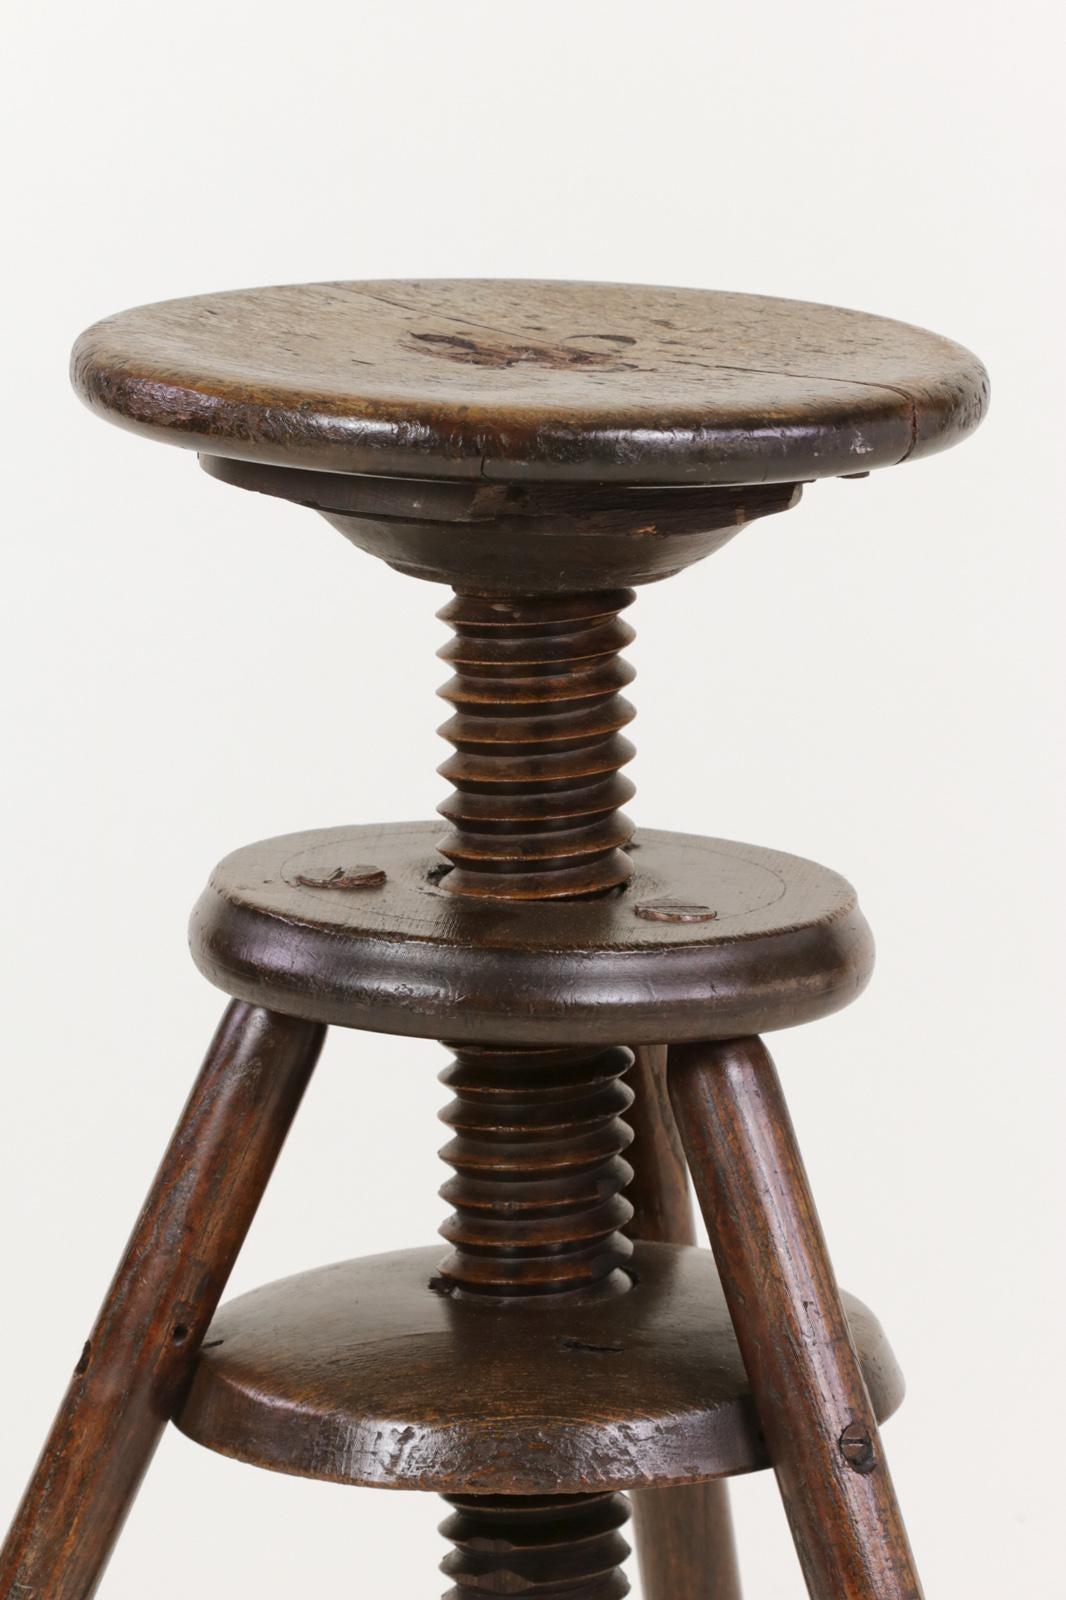 Merveilleux 1870s English Oak Three Legged Adjustable Artist Stool For Sale   Image 9  Of 12